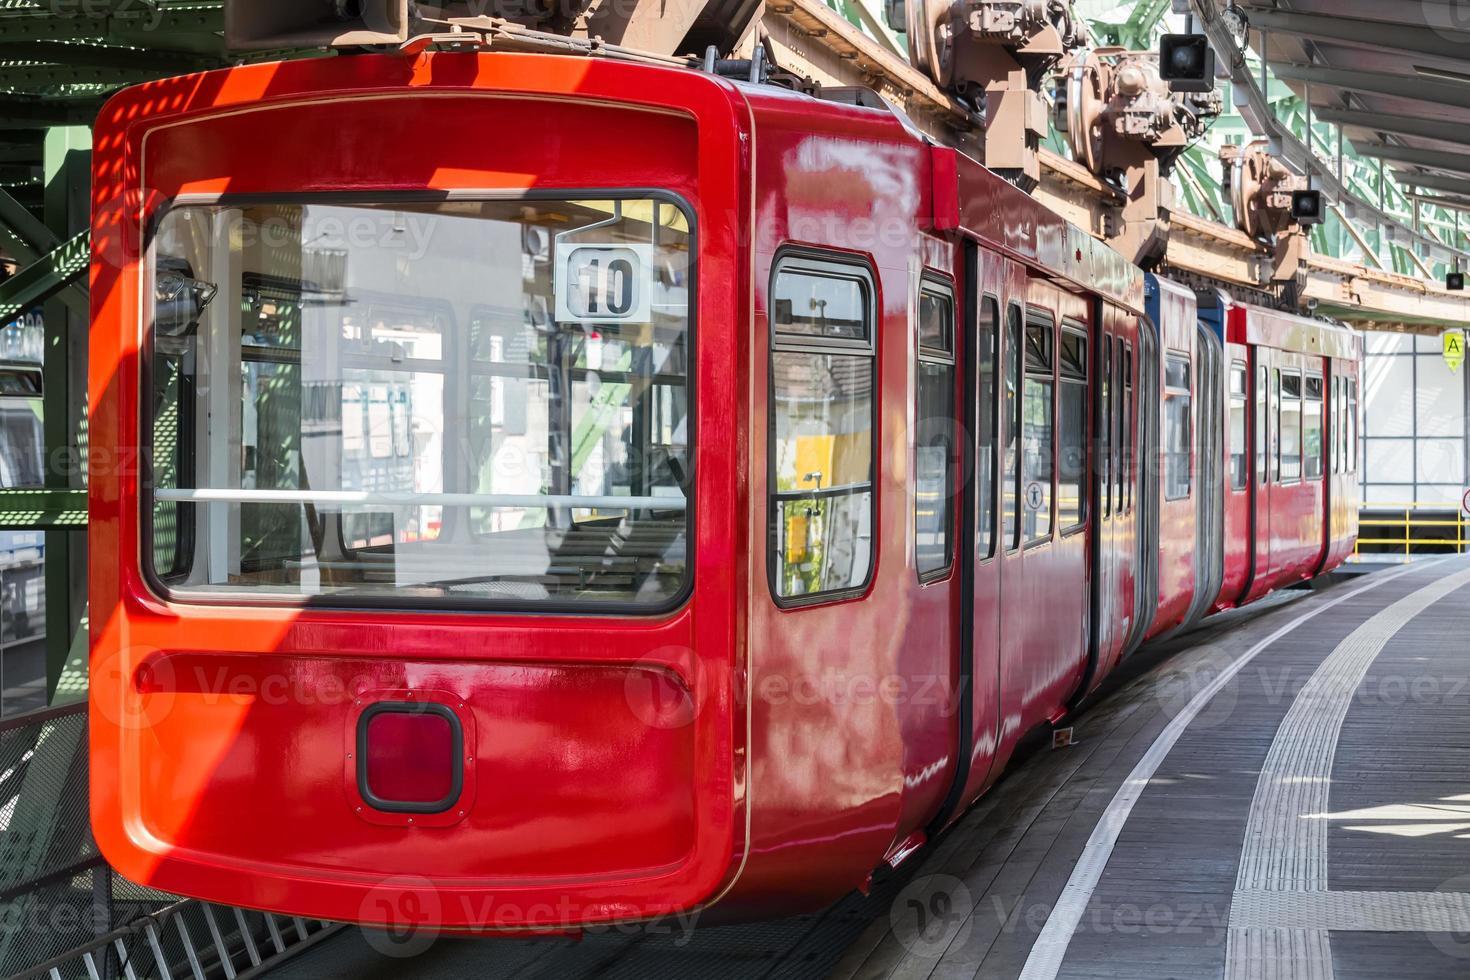 schwebebahn tåg i Wuppertal Tyskland foto